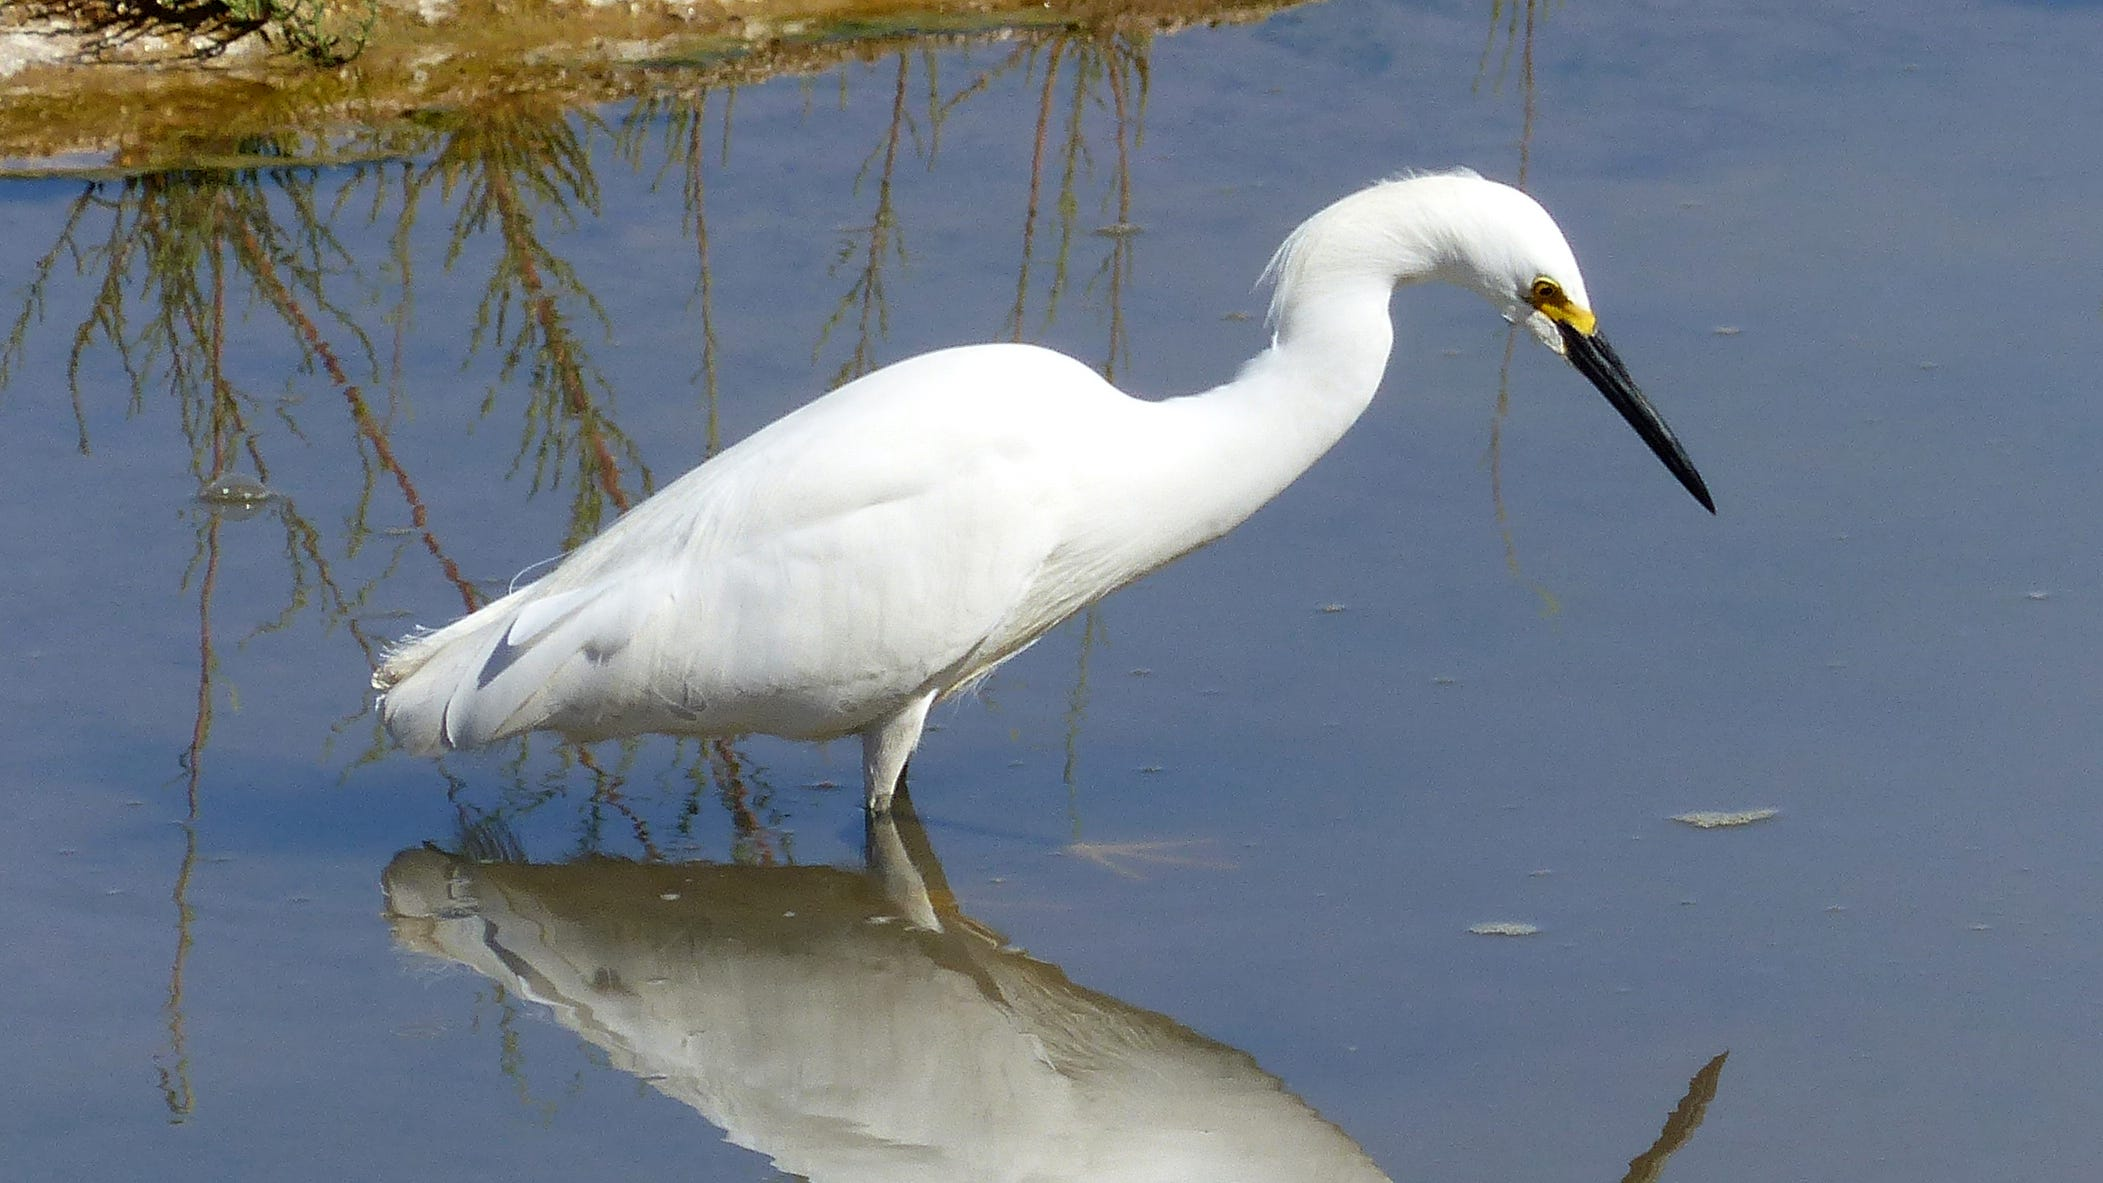 Area Watering Holes Wetlands Vital To Wading Birds